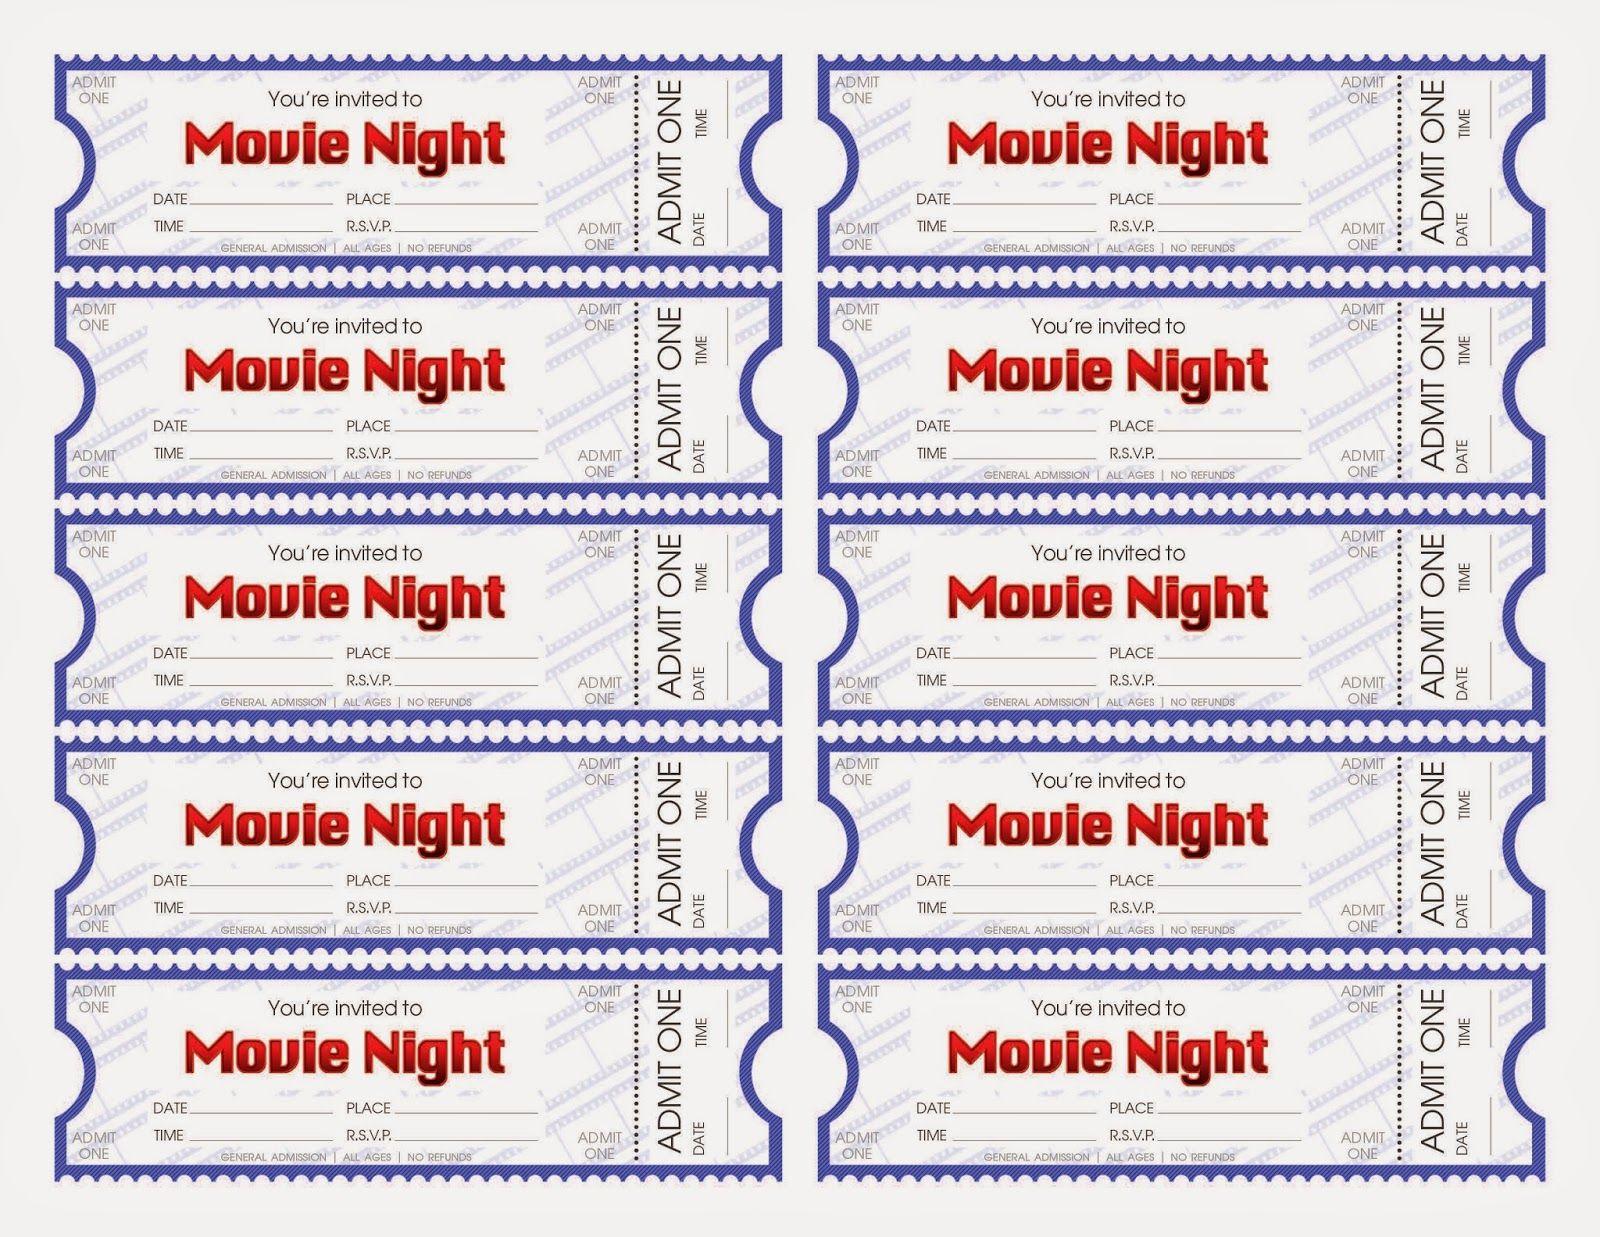 Ootw Movie Night Movie Night Flyer Movie Ticket Template Movie Night Tickets Free printable movie tickets template